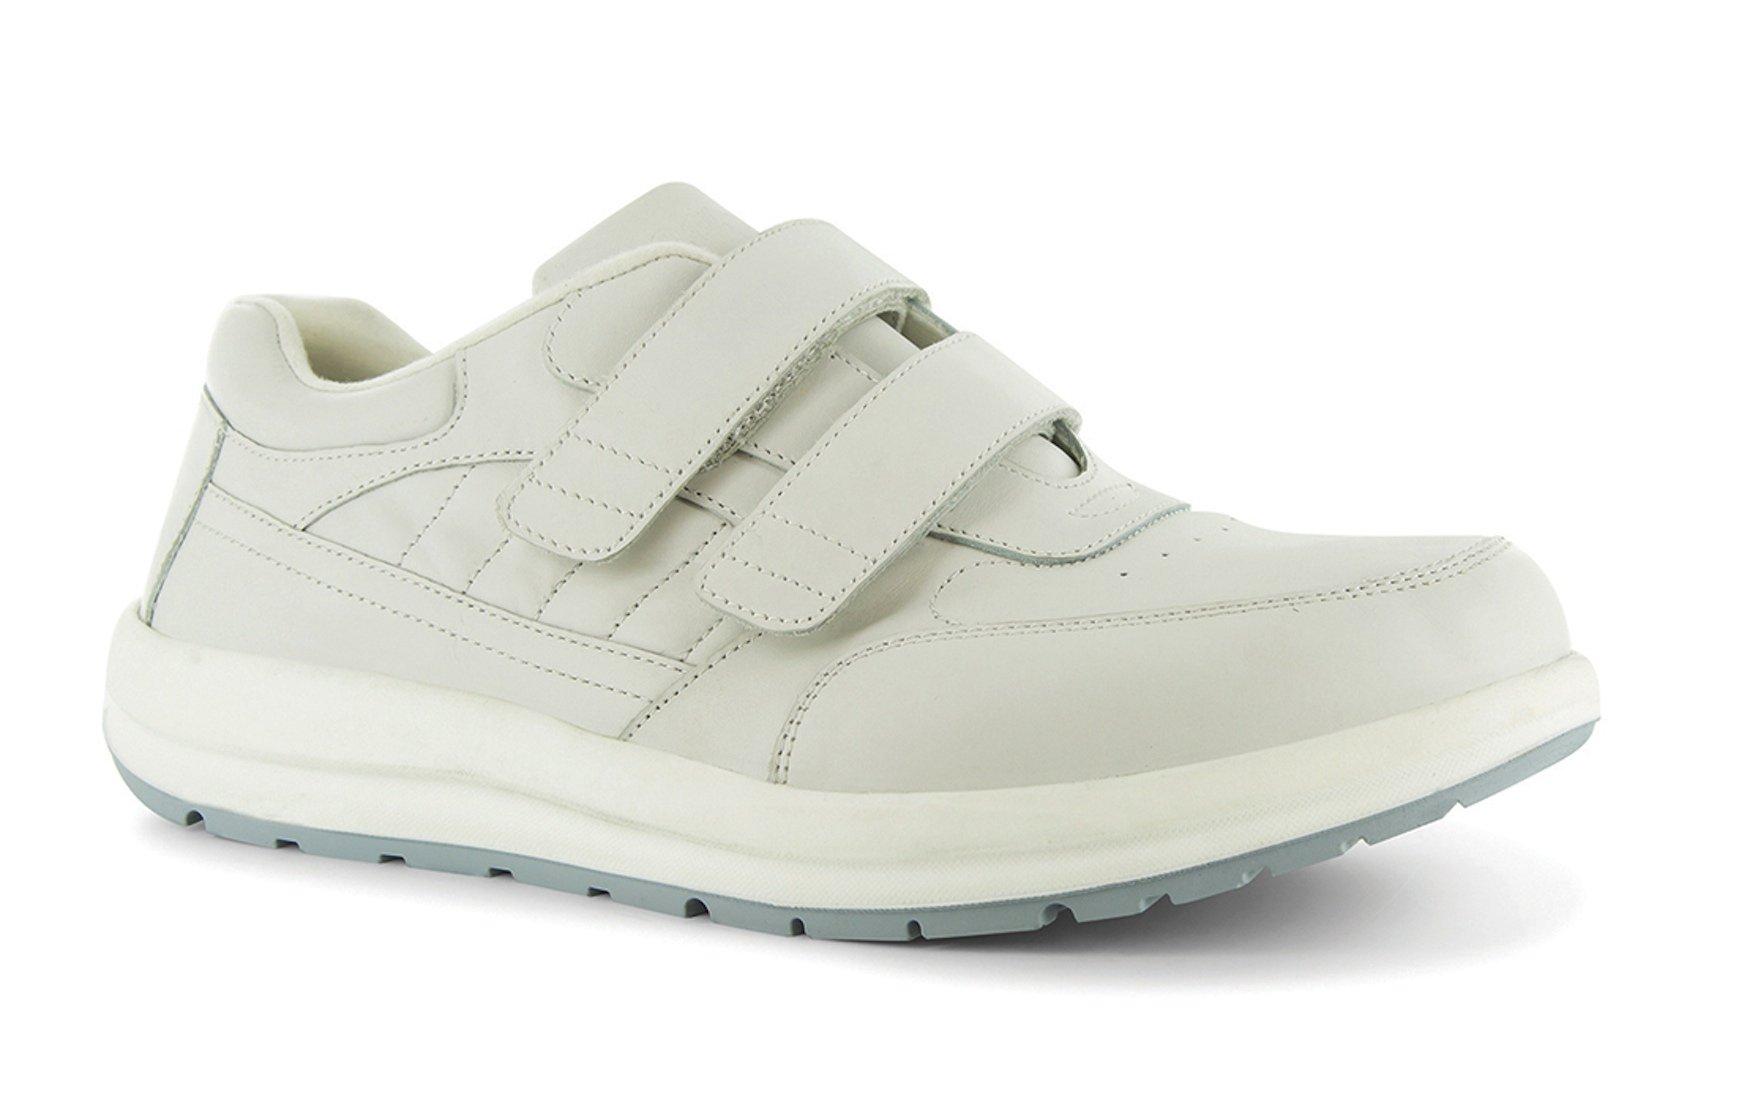 P W Minor Performance Walker Men's Therapeutic Casual Extra Depth Shoe: White 9.5 Medium (D) Velcro